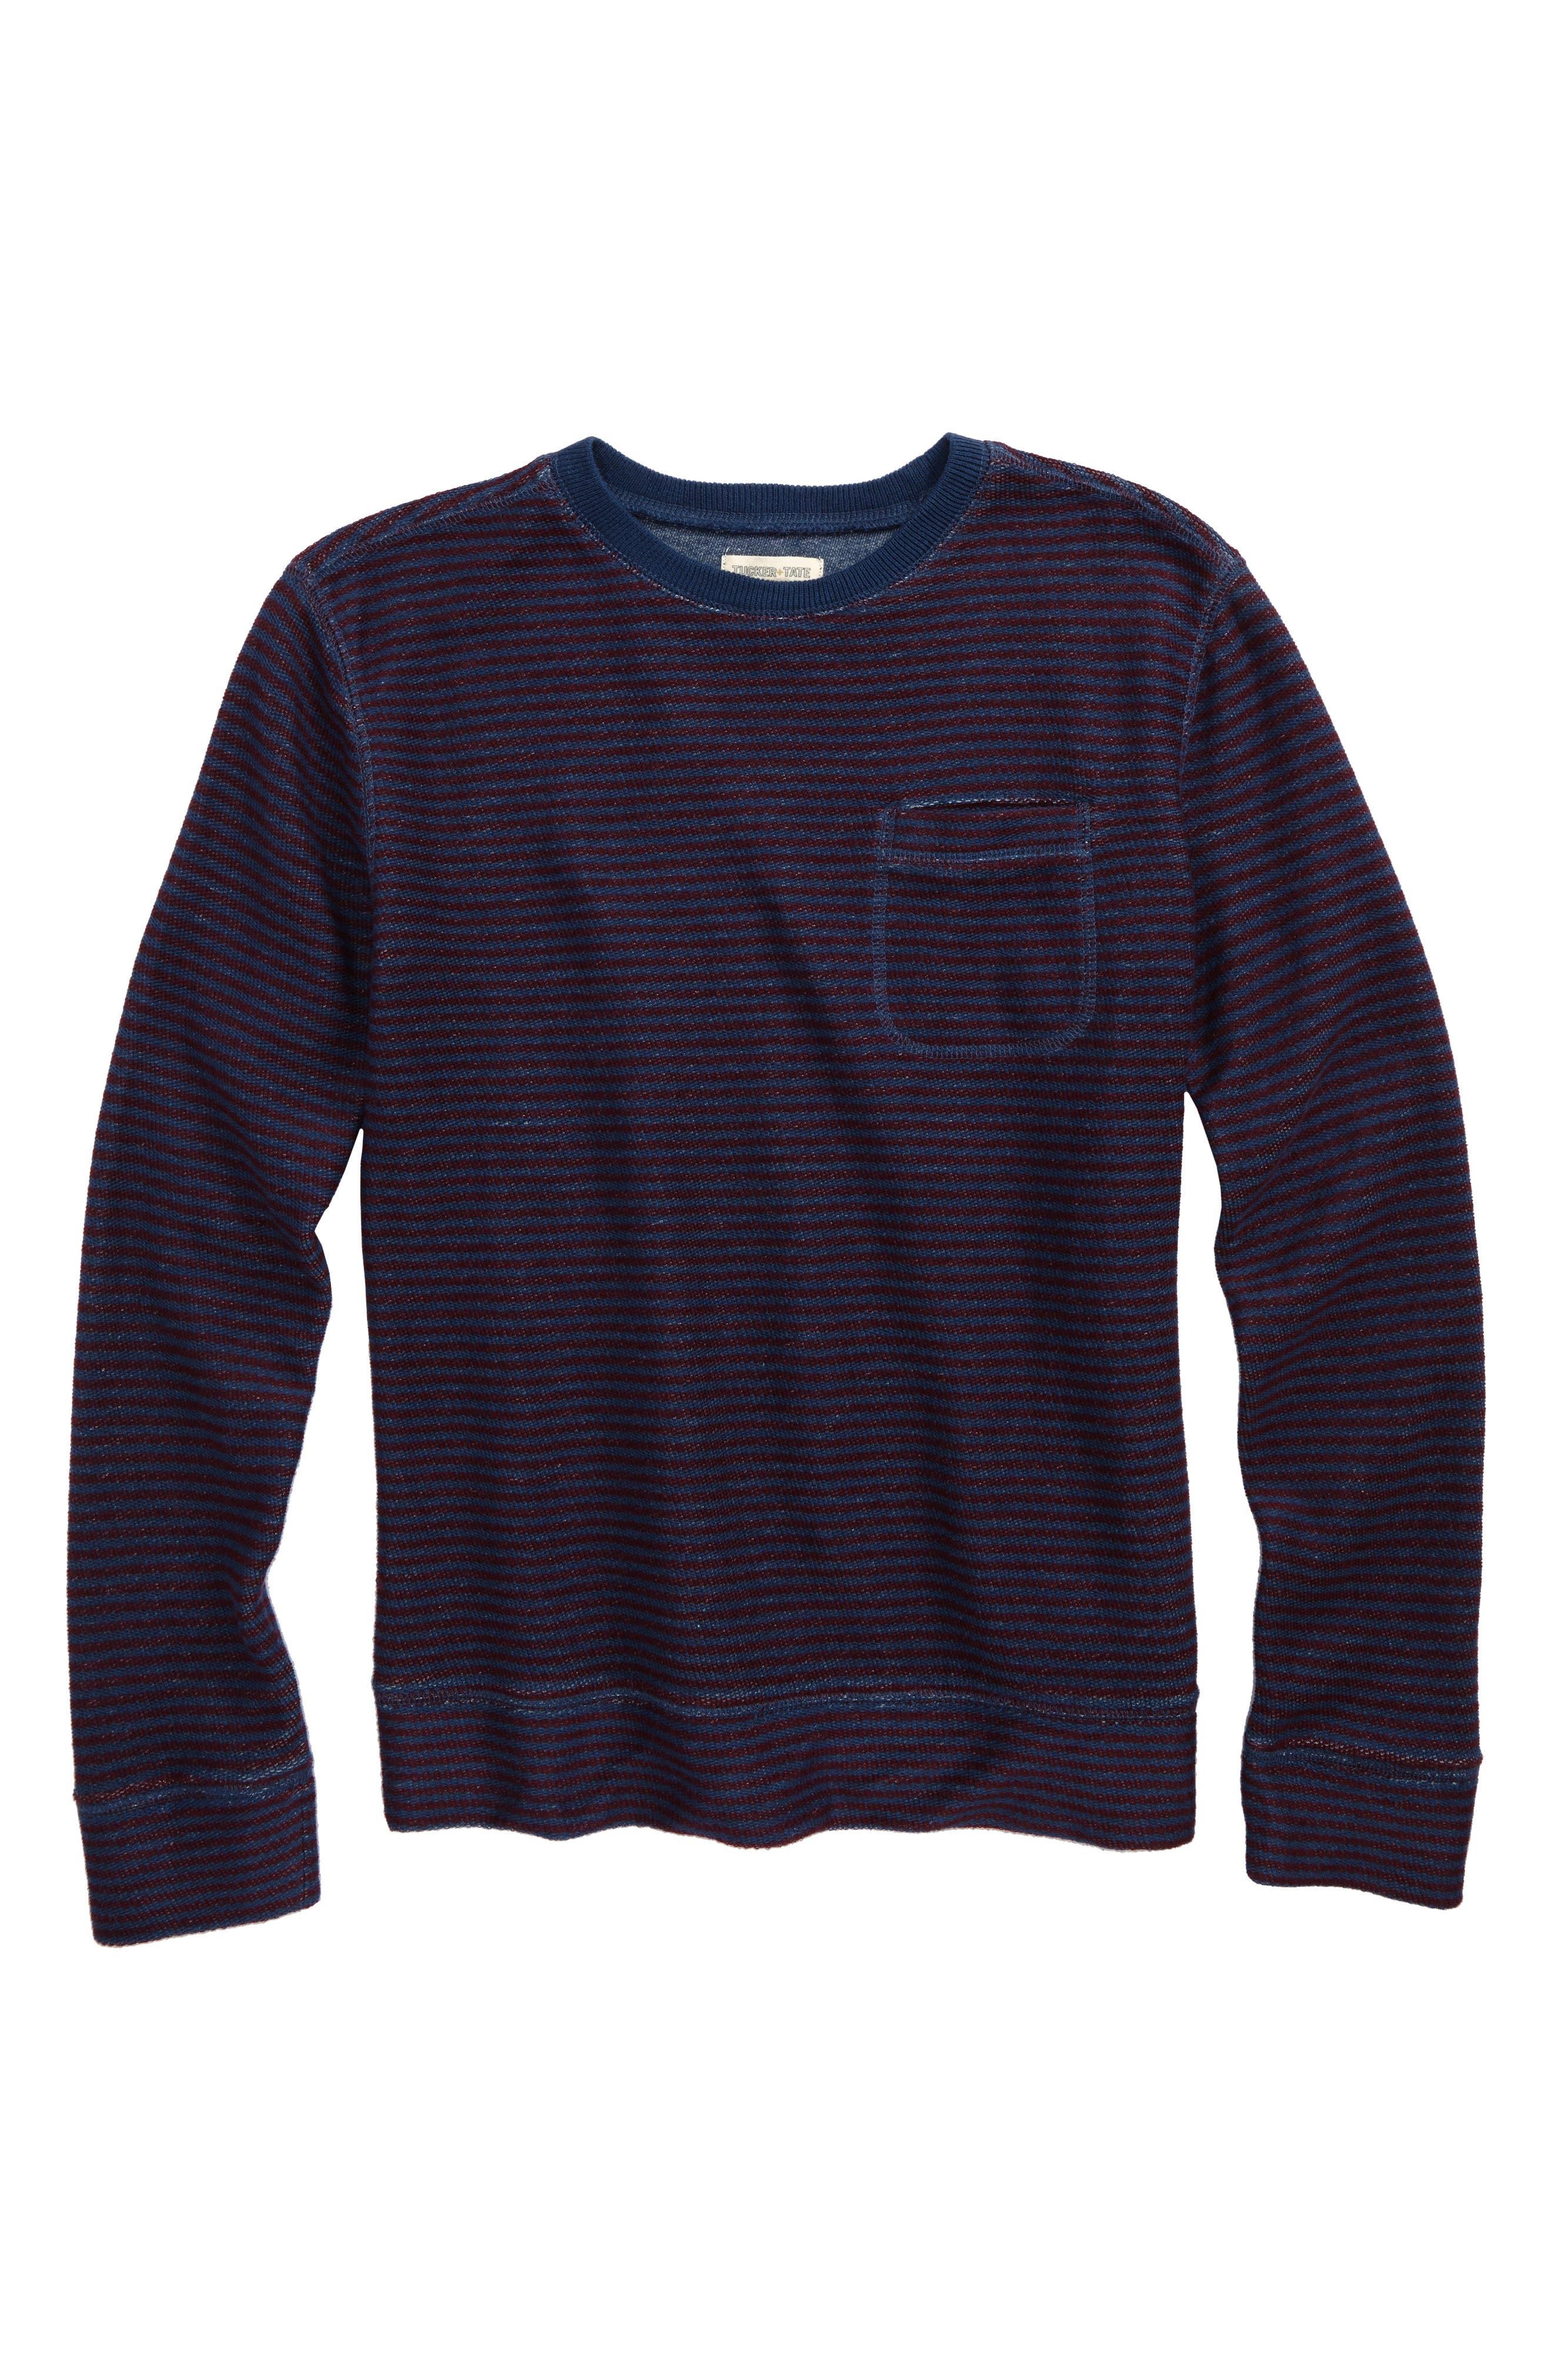 Main Image - Tucker + Tate Stripe Crewneck Sweatshirt (Big Boys)